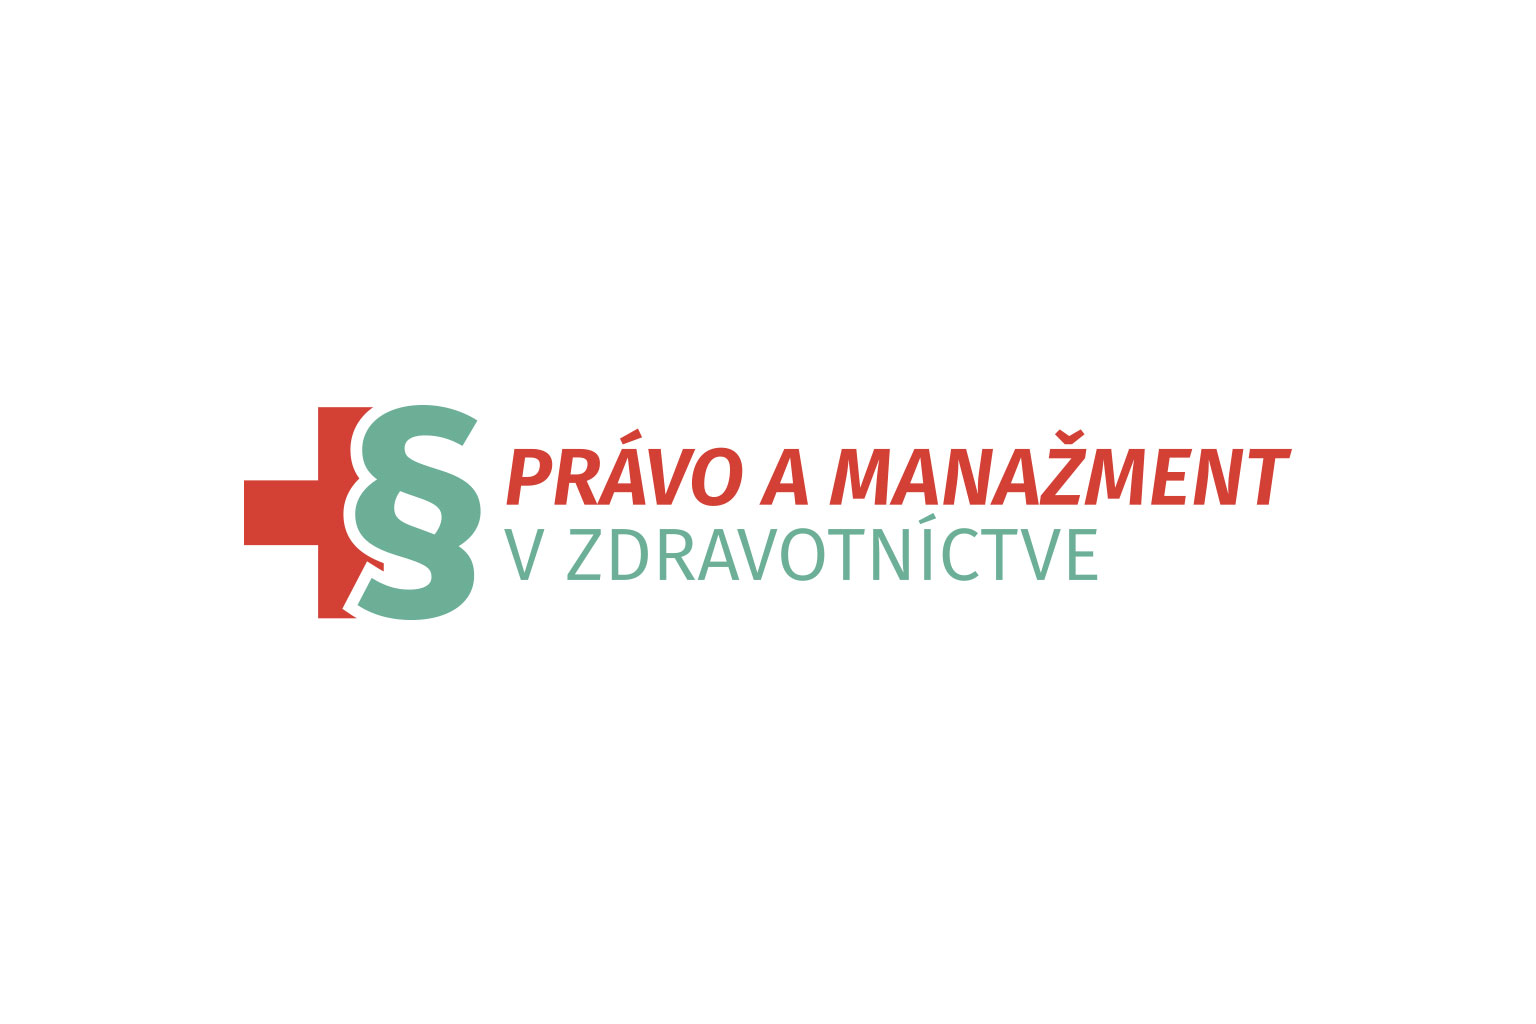 06-pravovzdravotnictve